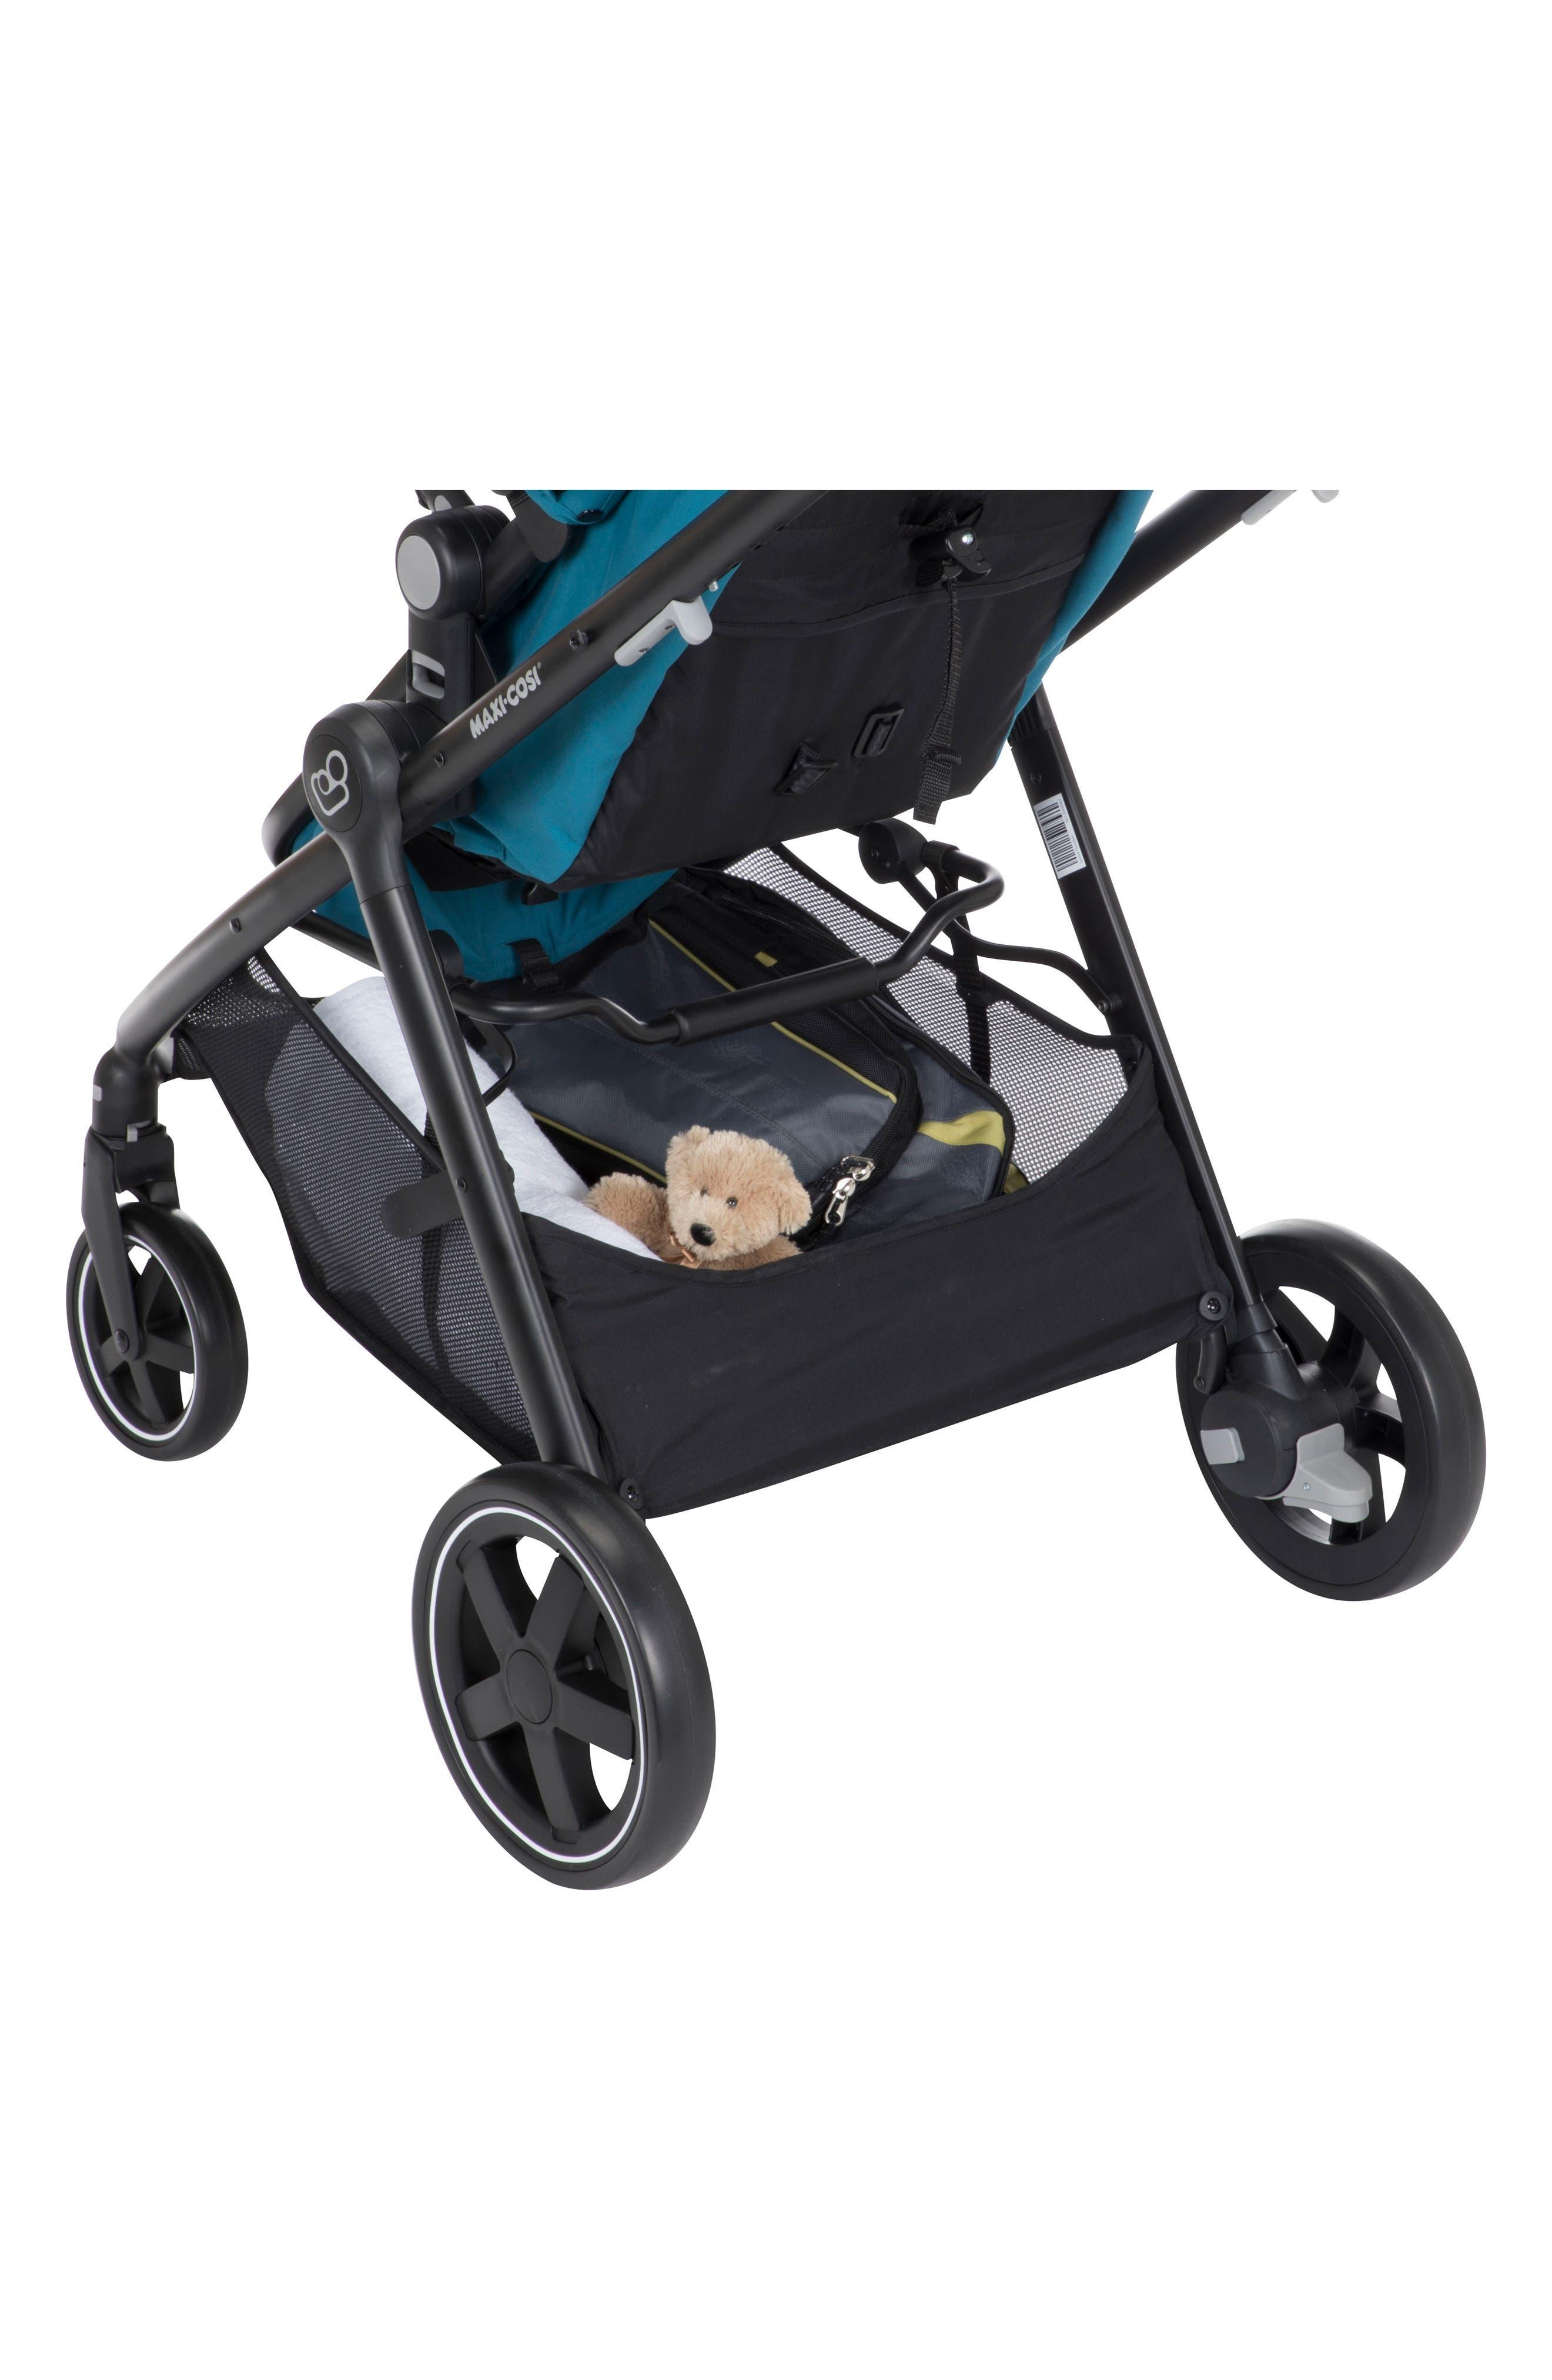 5-1 Mico 30 Infant Car Seat & Zelia Stroller Modular Travel System,                             Alternate thumbnail 5, color,                             EMERALD TIDE